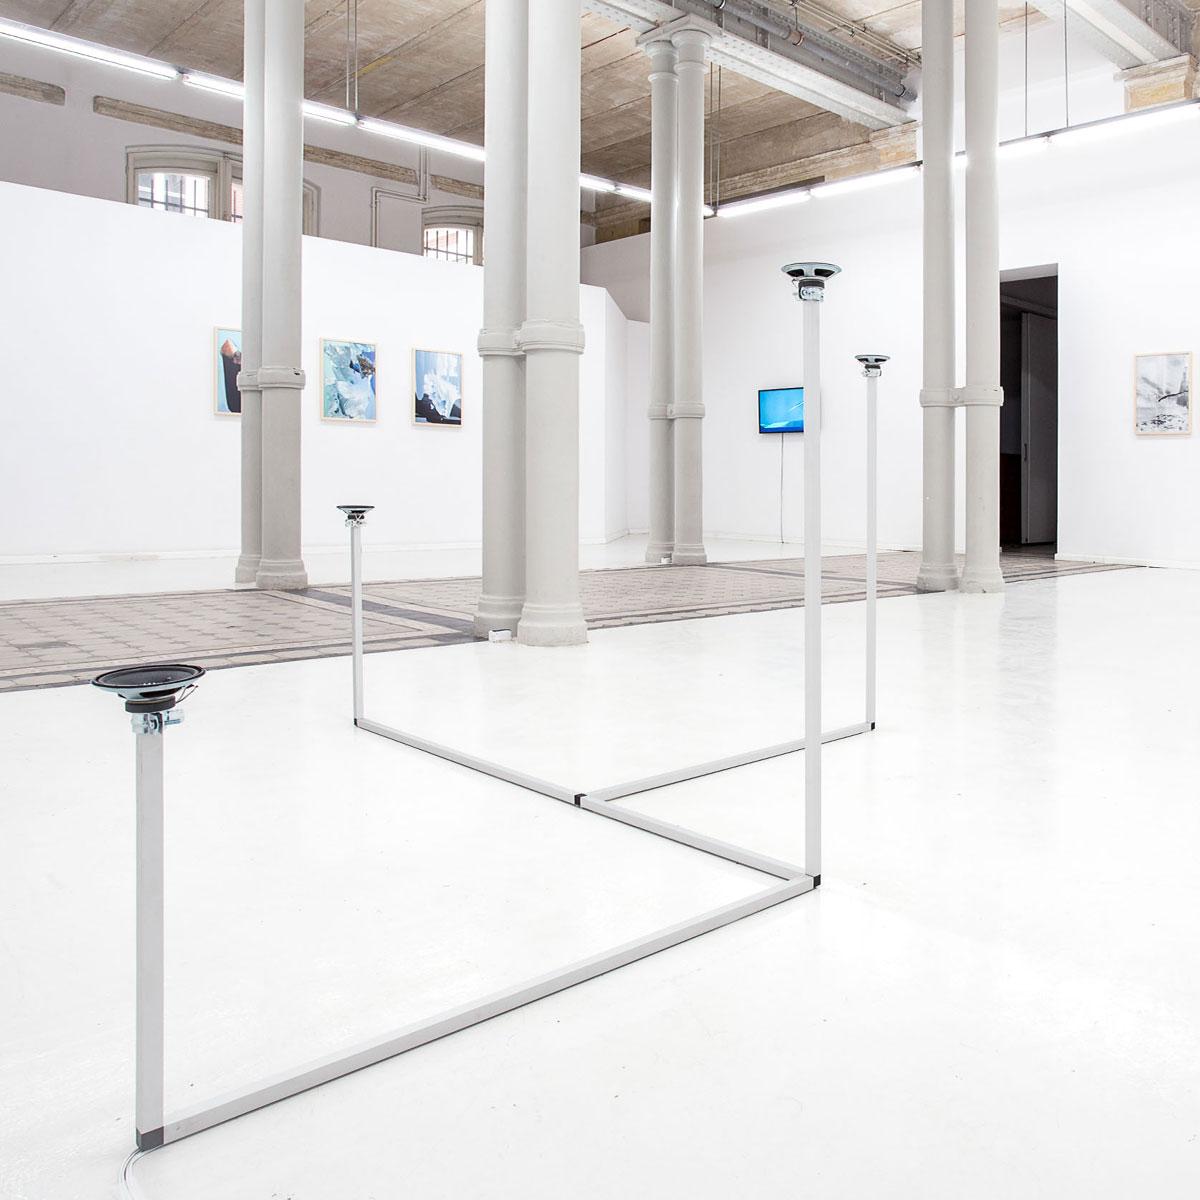 Jacek Doroszenko - How to travel - Sound installation - Warsaw - Gallery - Exhibition 02